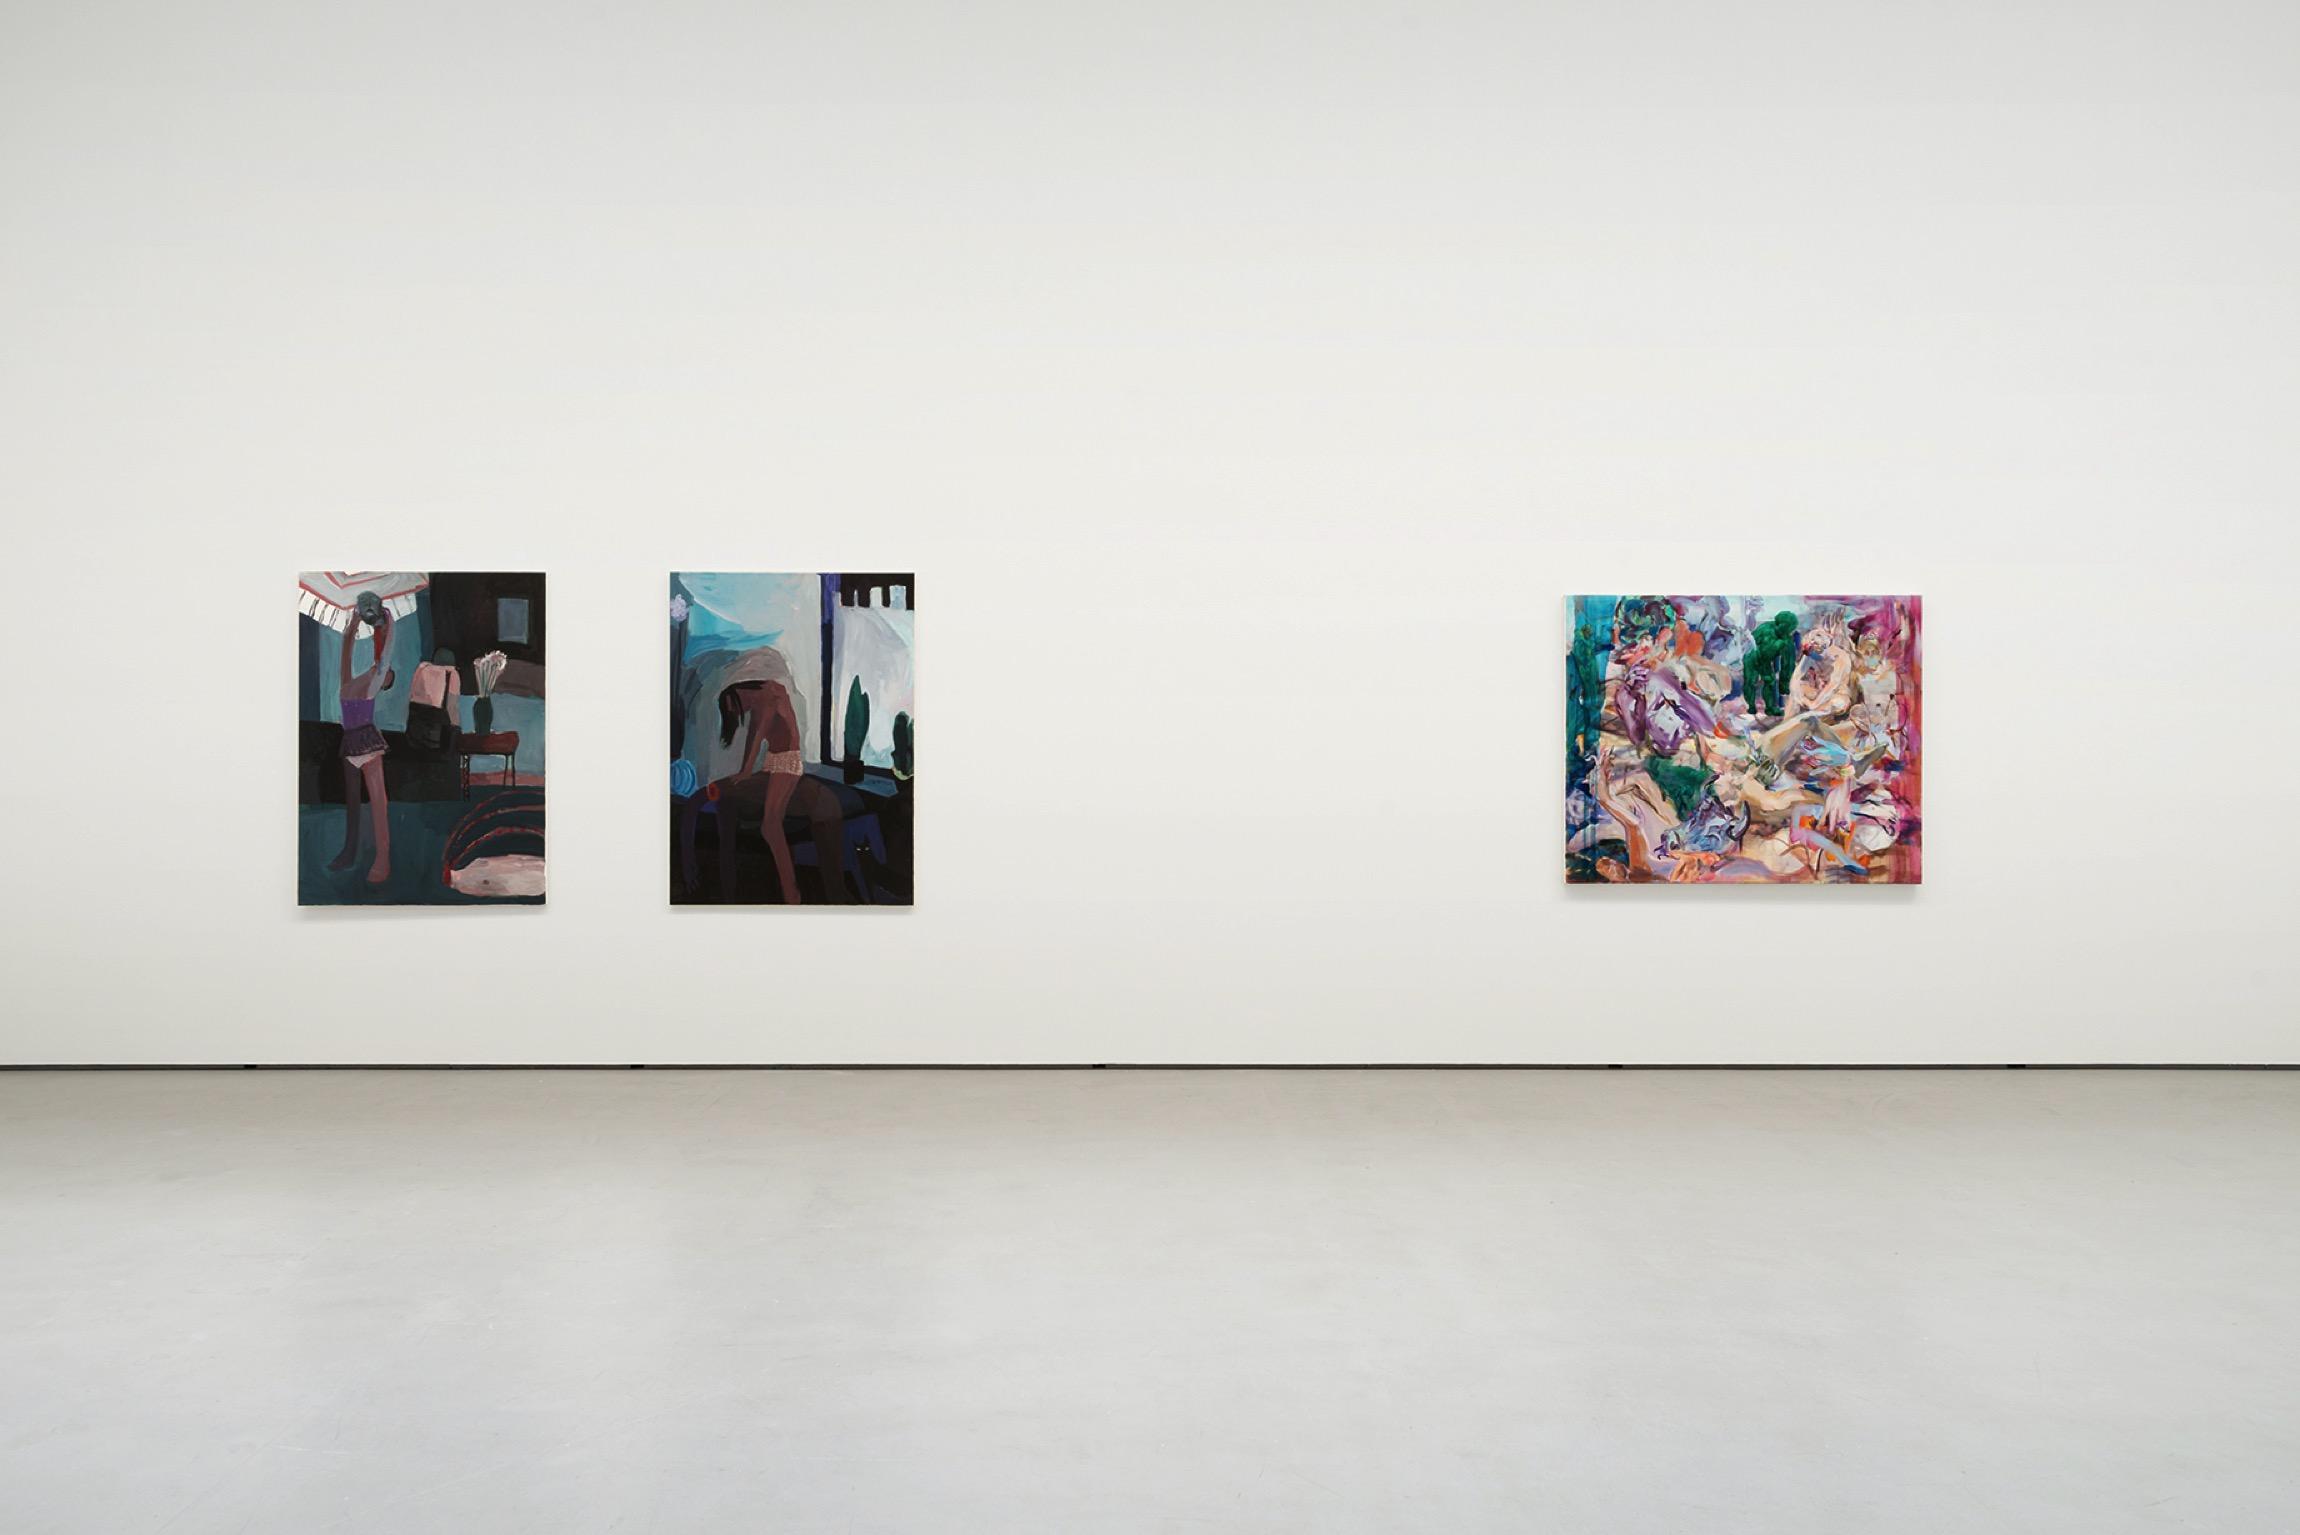 2018 Helene Appel, Alisa Margolis & Helen Verhoeven